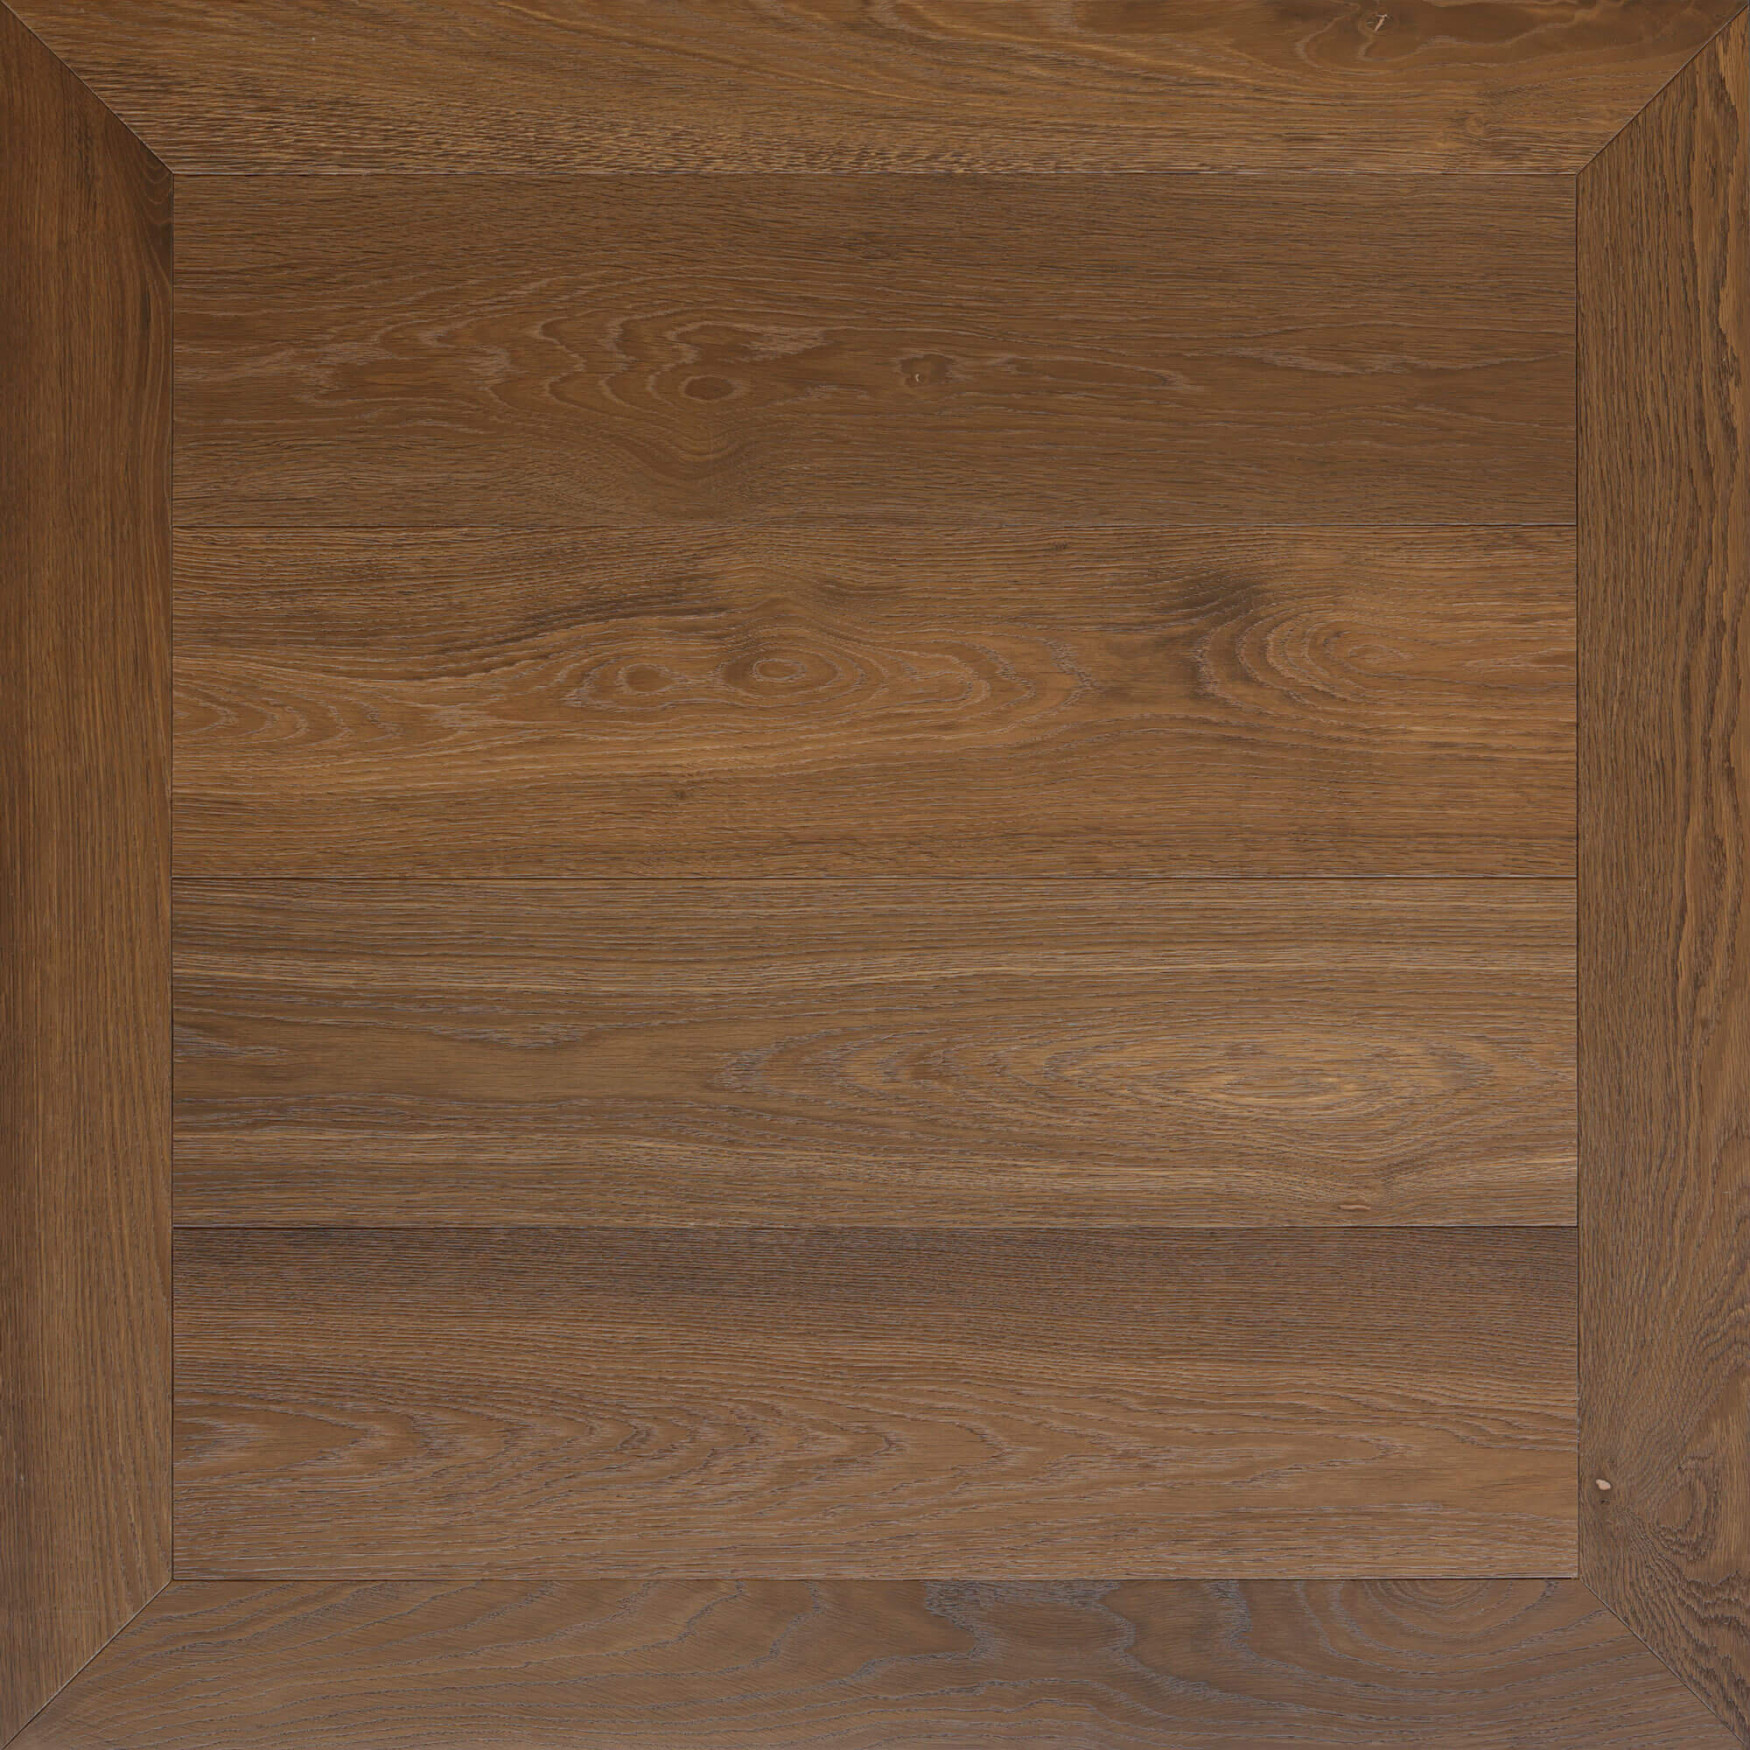 Light Parisian Oak – MOD 205 (4 slat)